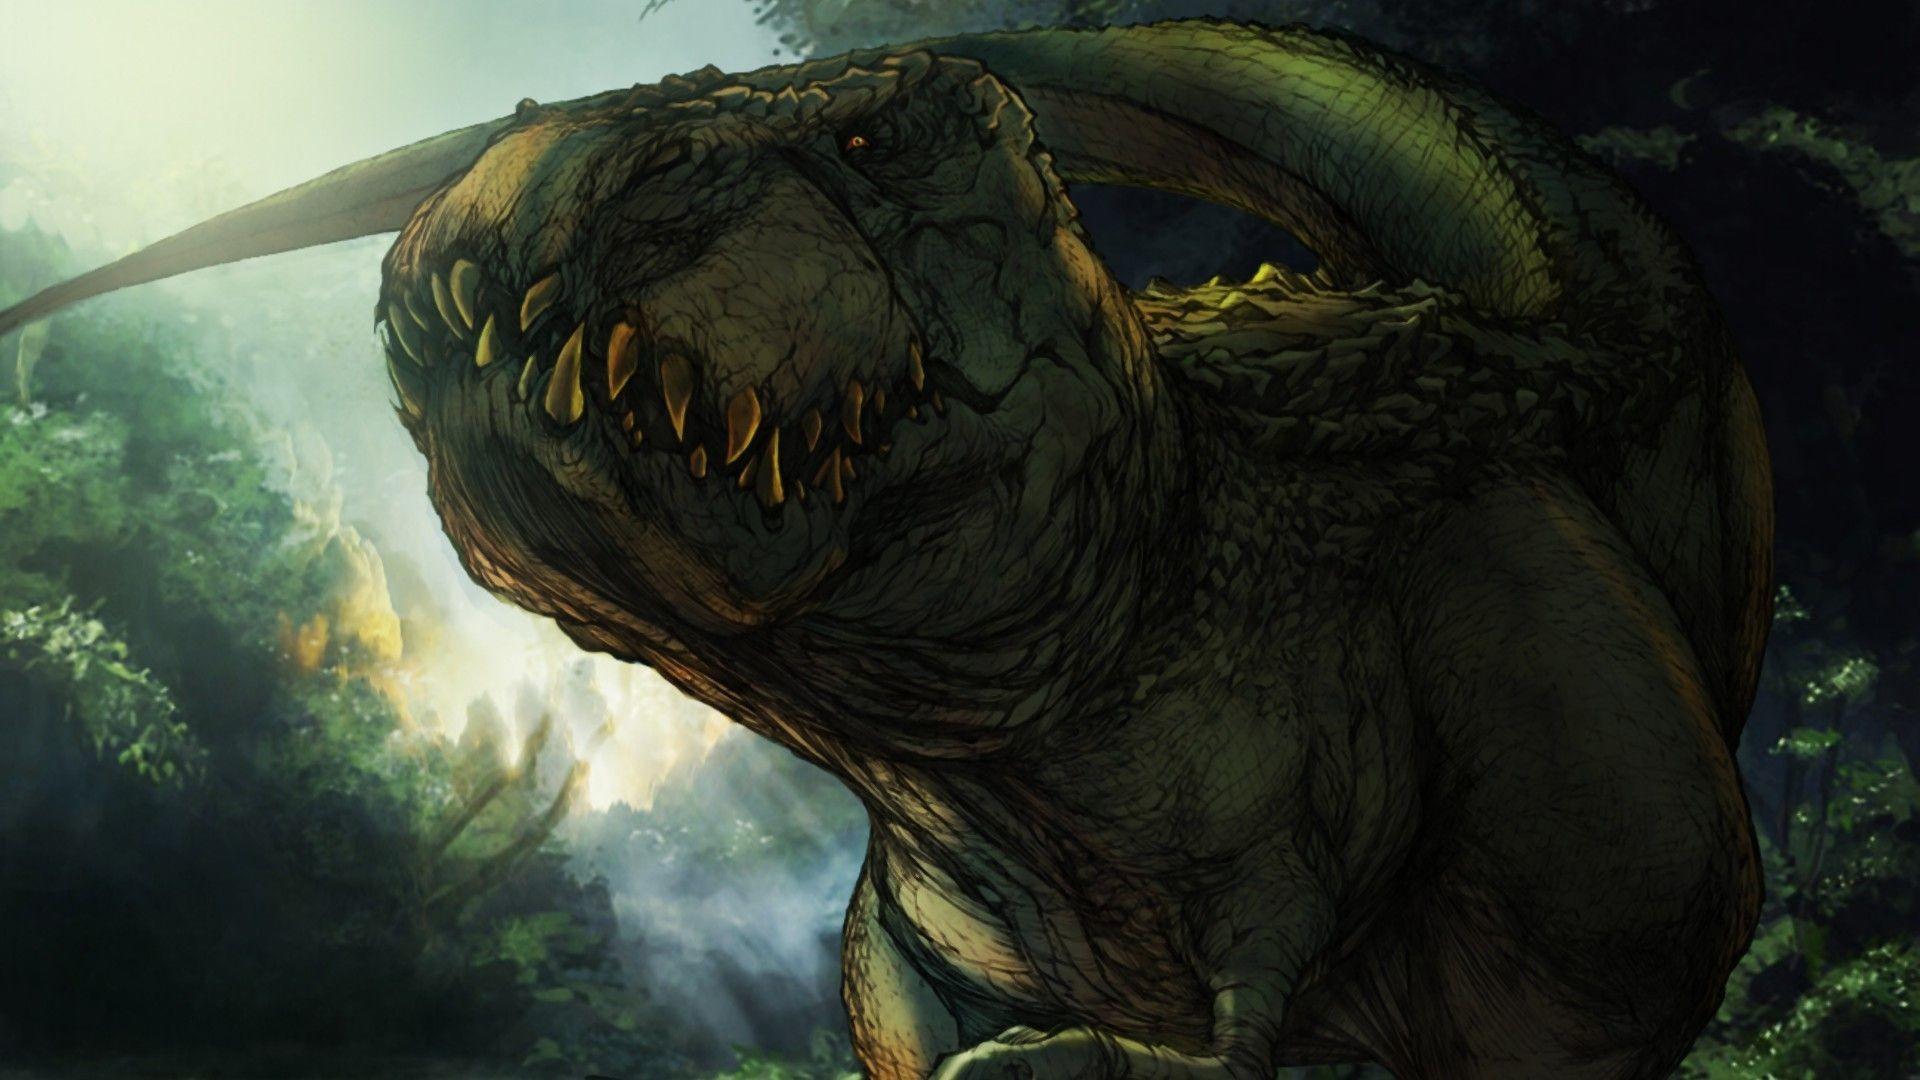 Dinosaur Wallpaper (69+ images)